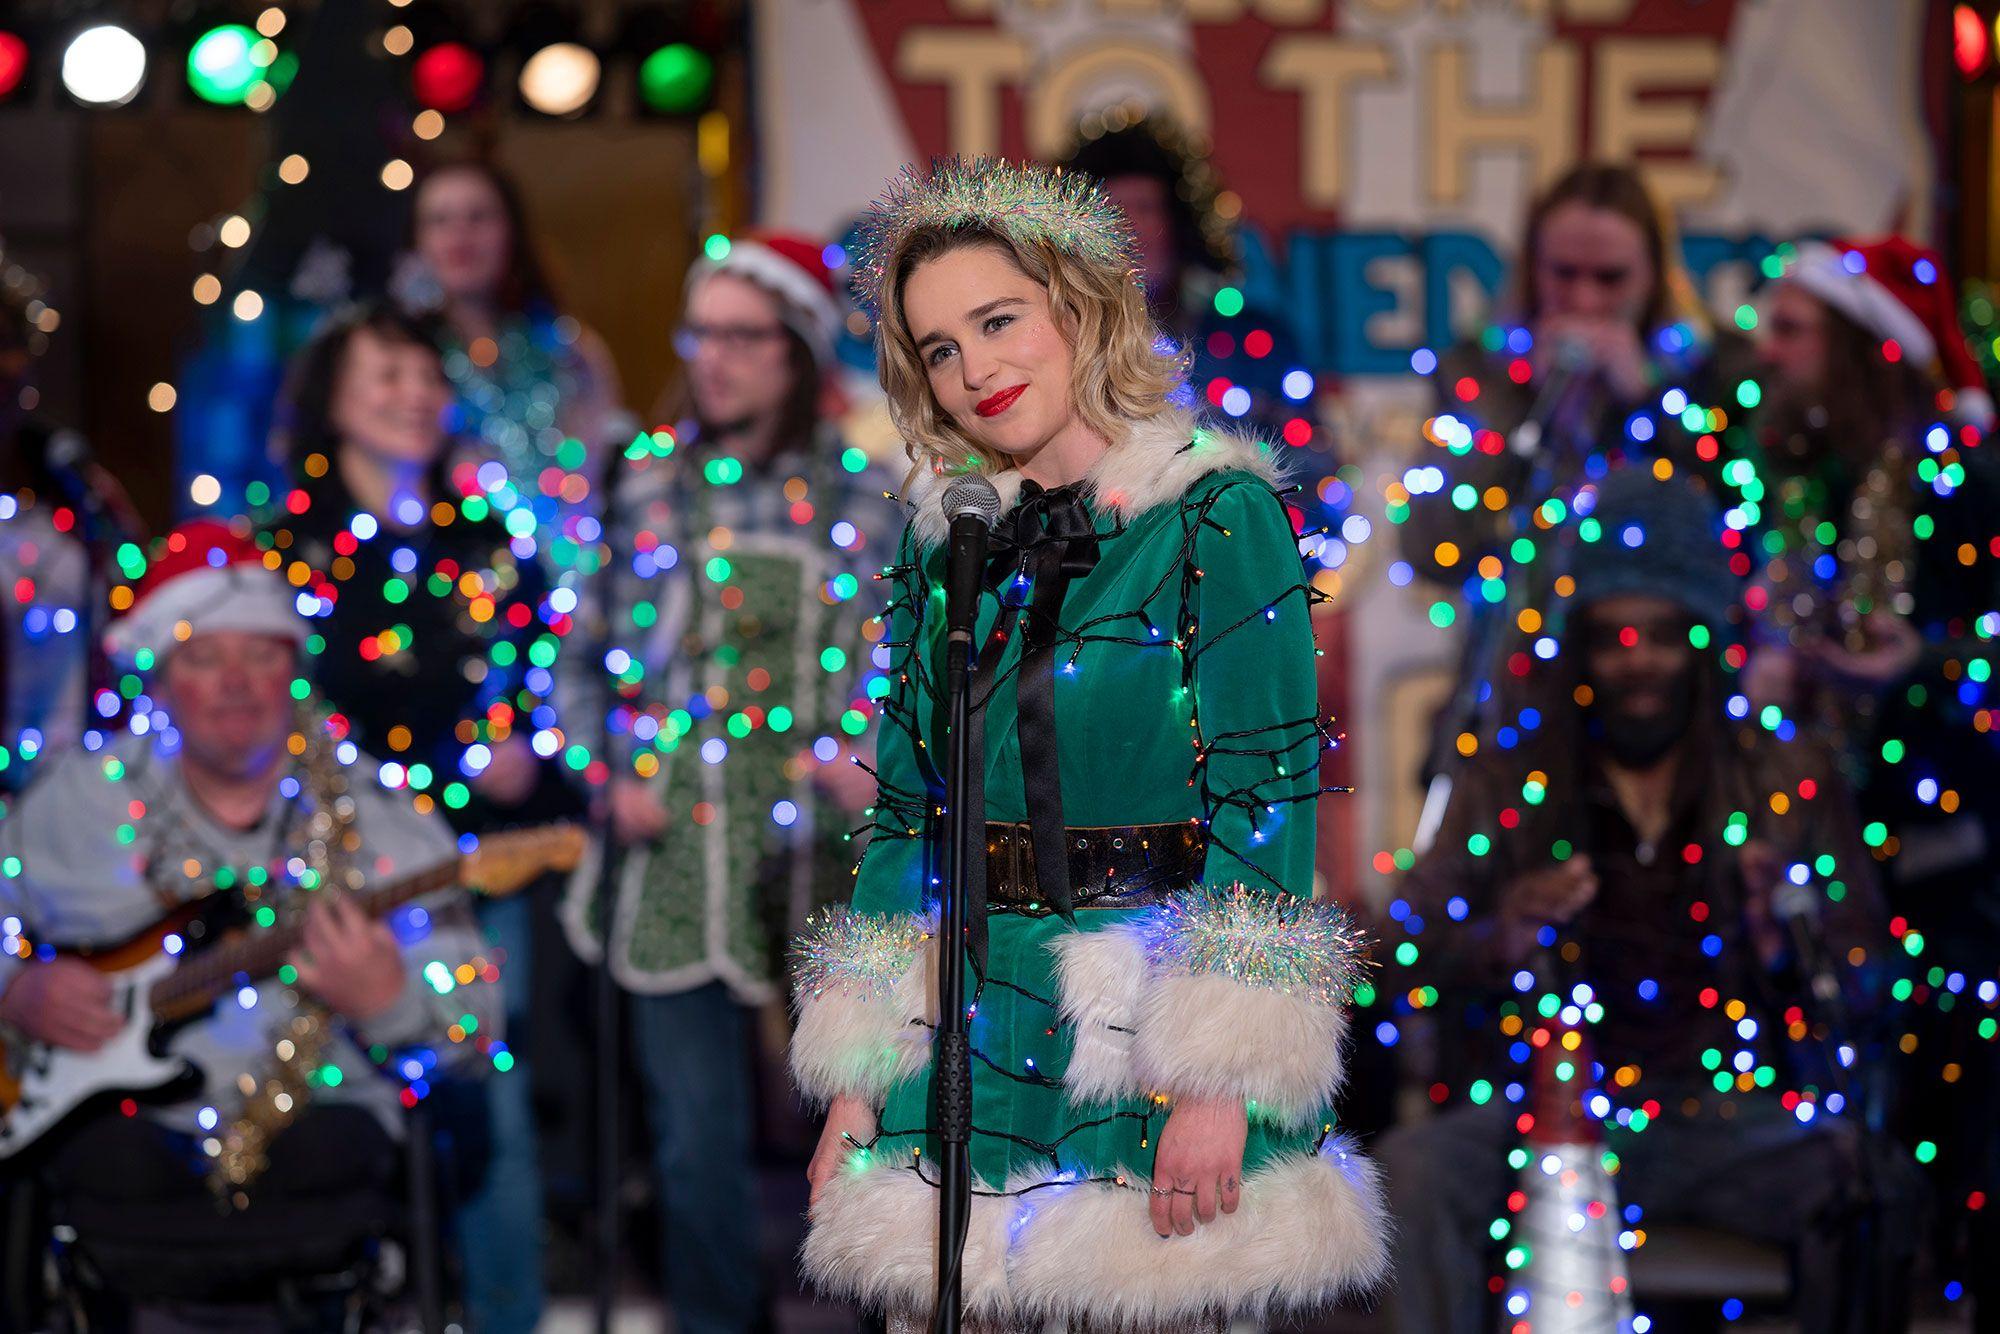 Last Christmas review - is Emilia